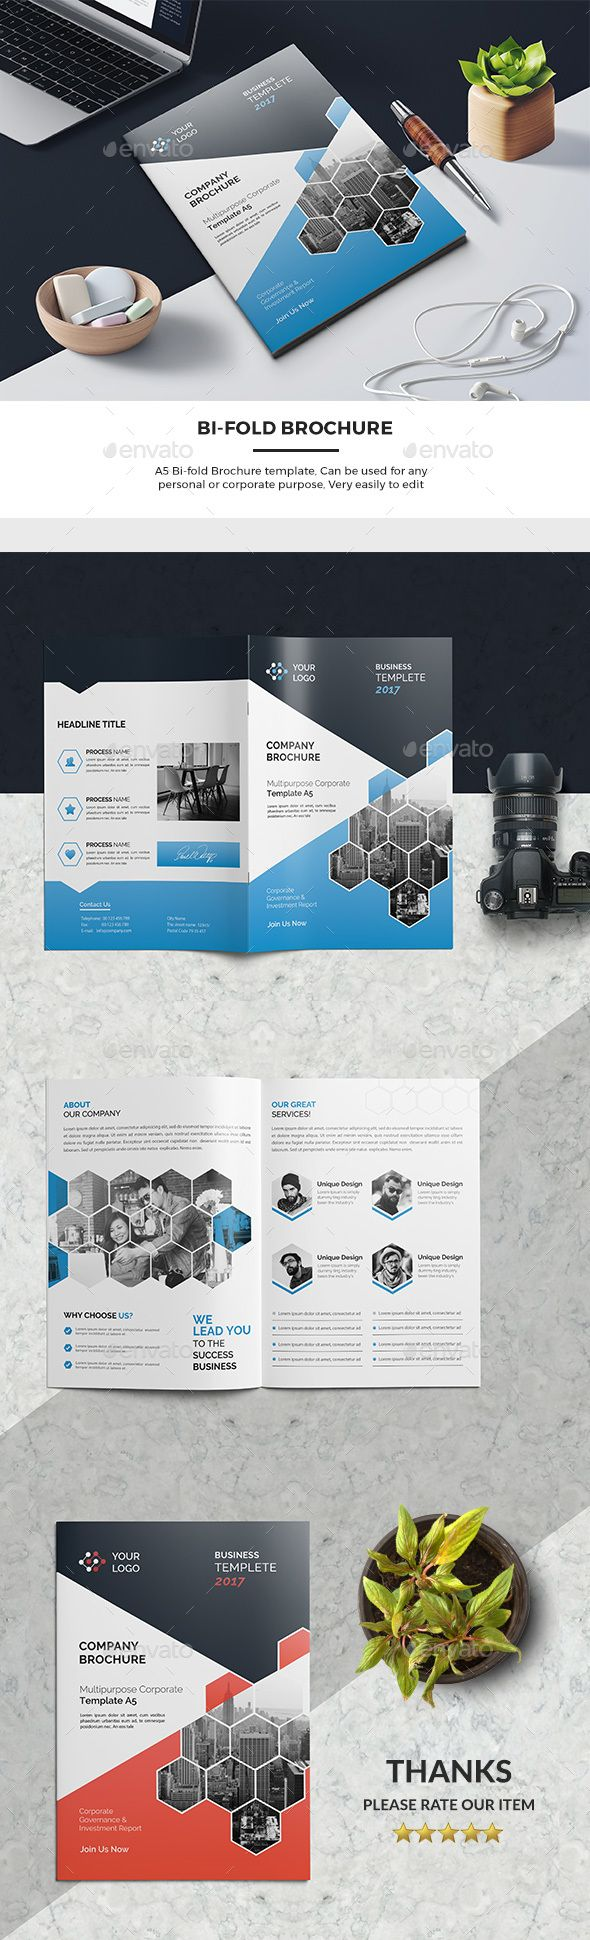 Corporate Bi-Fold Brochure 03 - #Corporate #Brochures Download here: https://graphicriver.net/item/corporate-bifold-brochure-03/19498129?ref=alena994